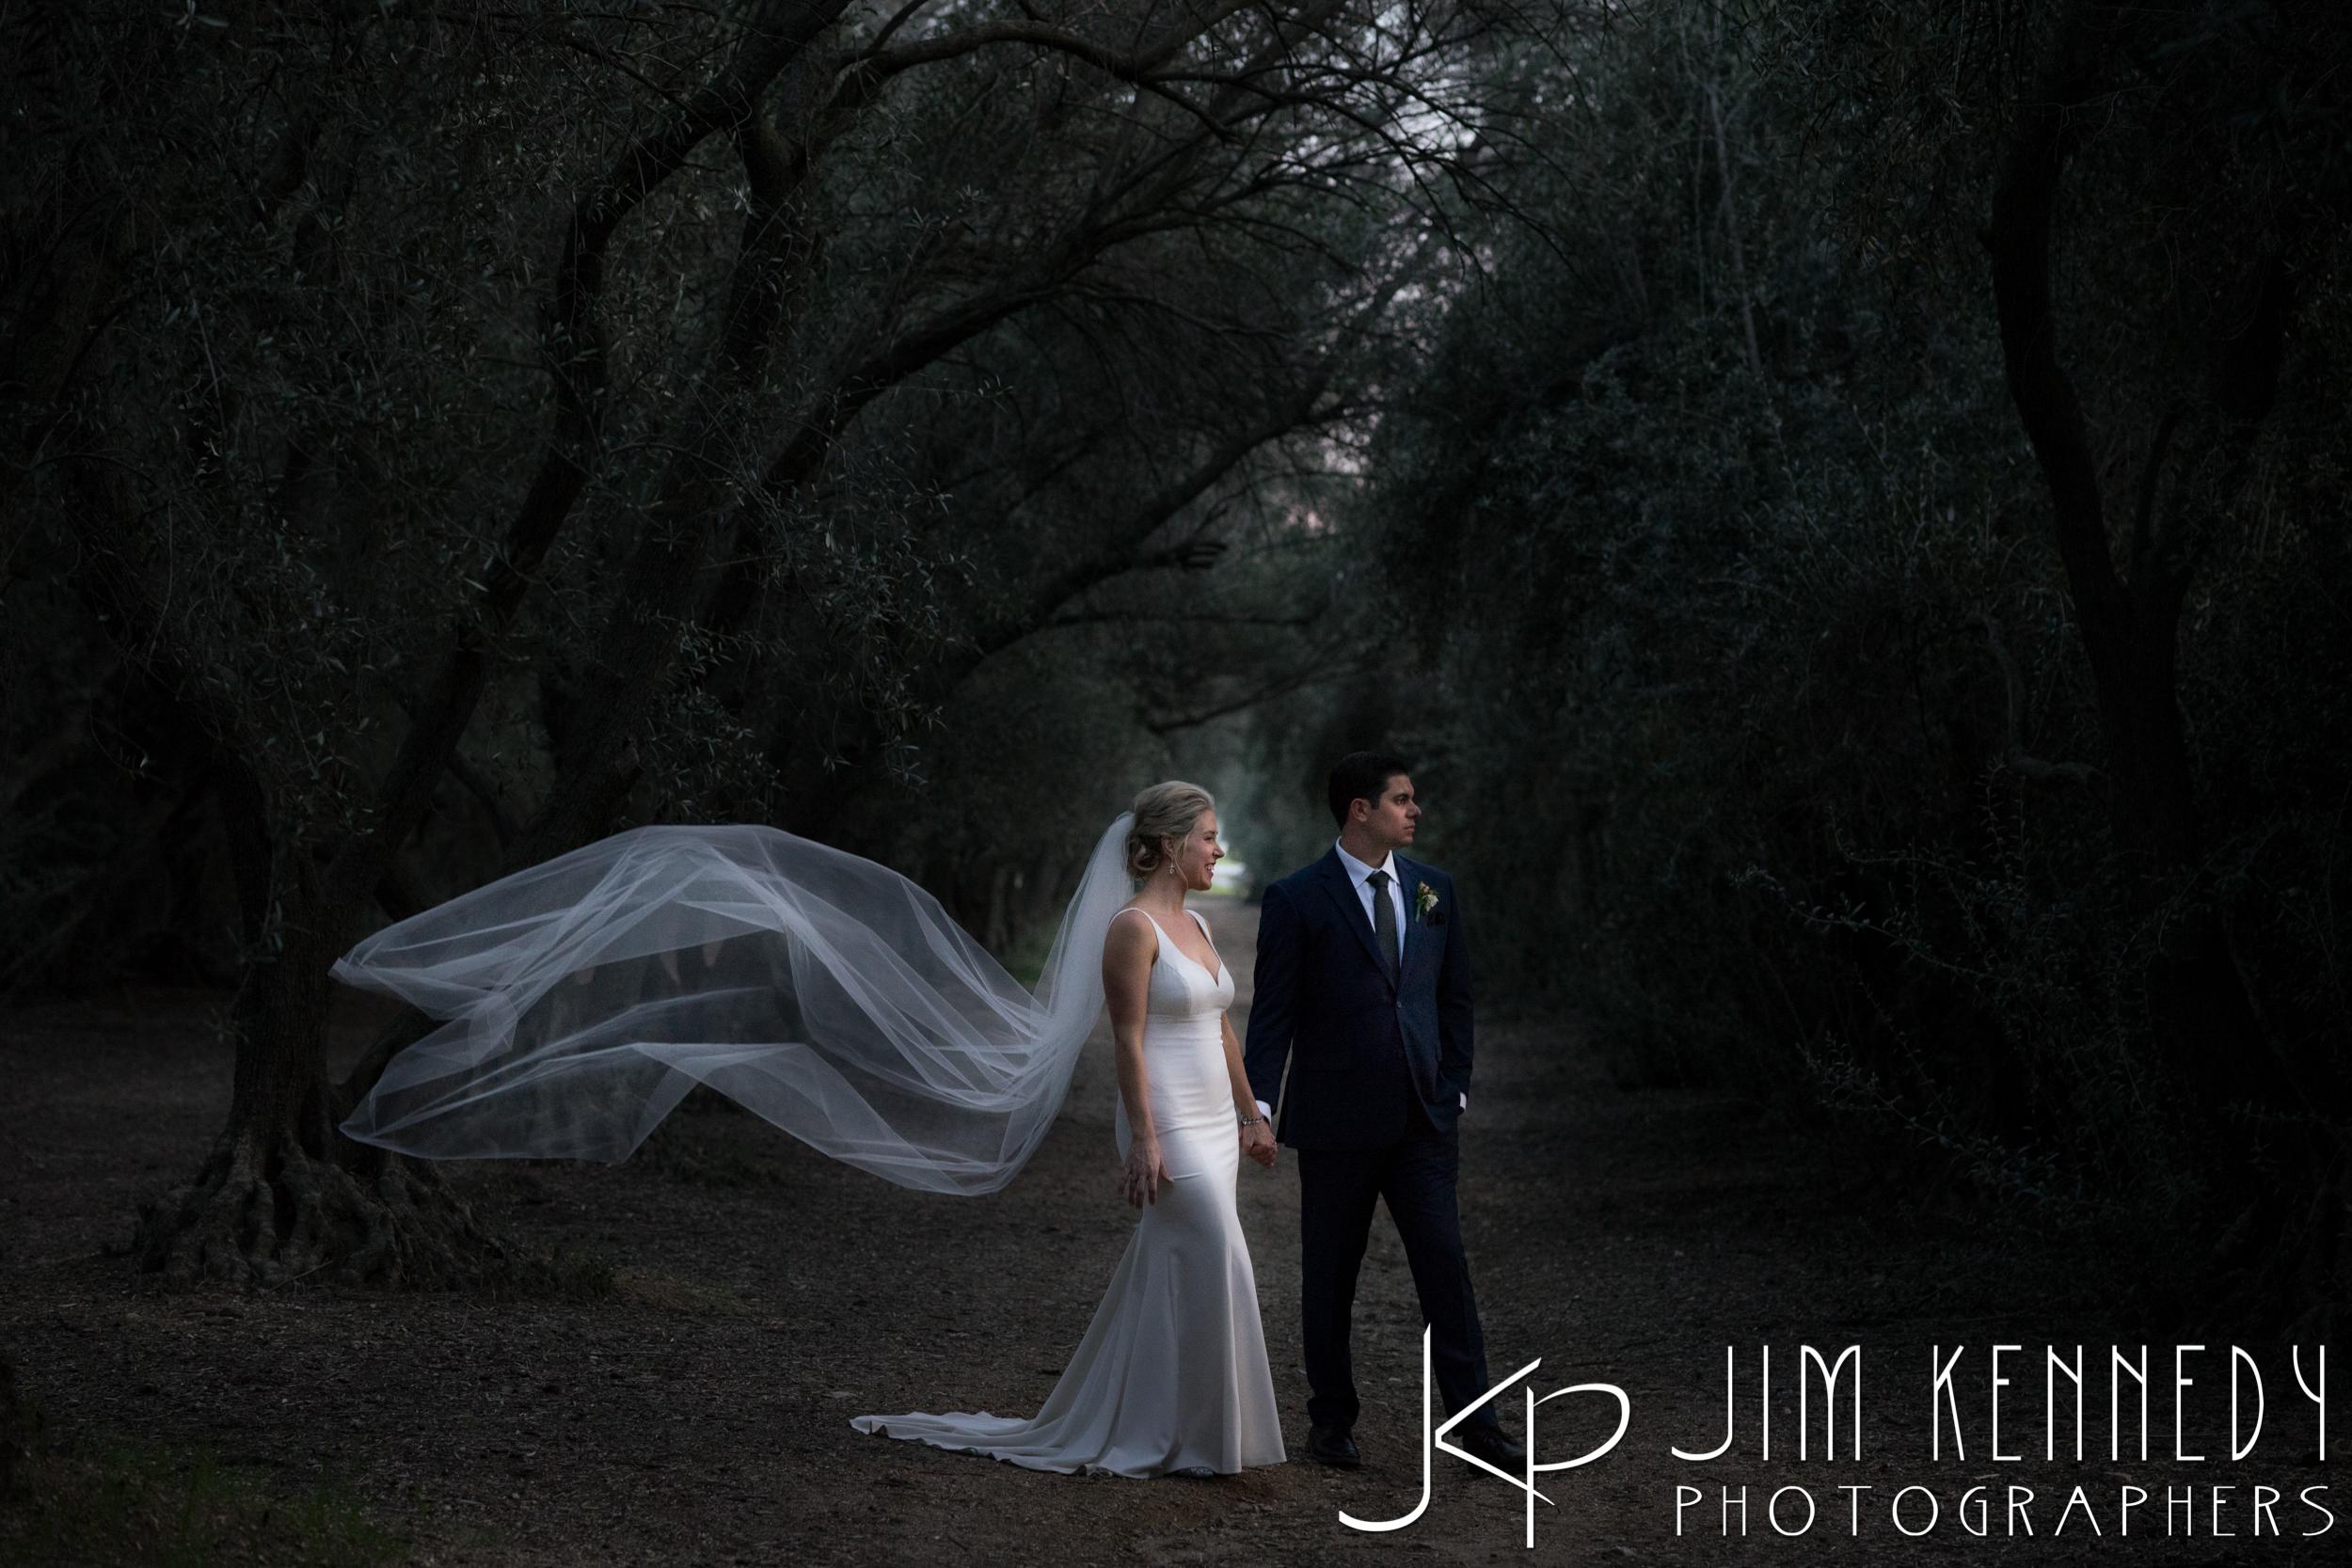 jim_kennedy_photographers_highland_springs_wedding_caitlyn_0155.jpg